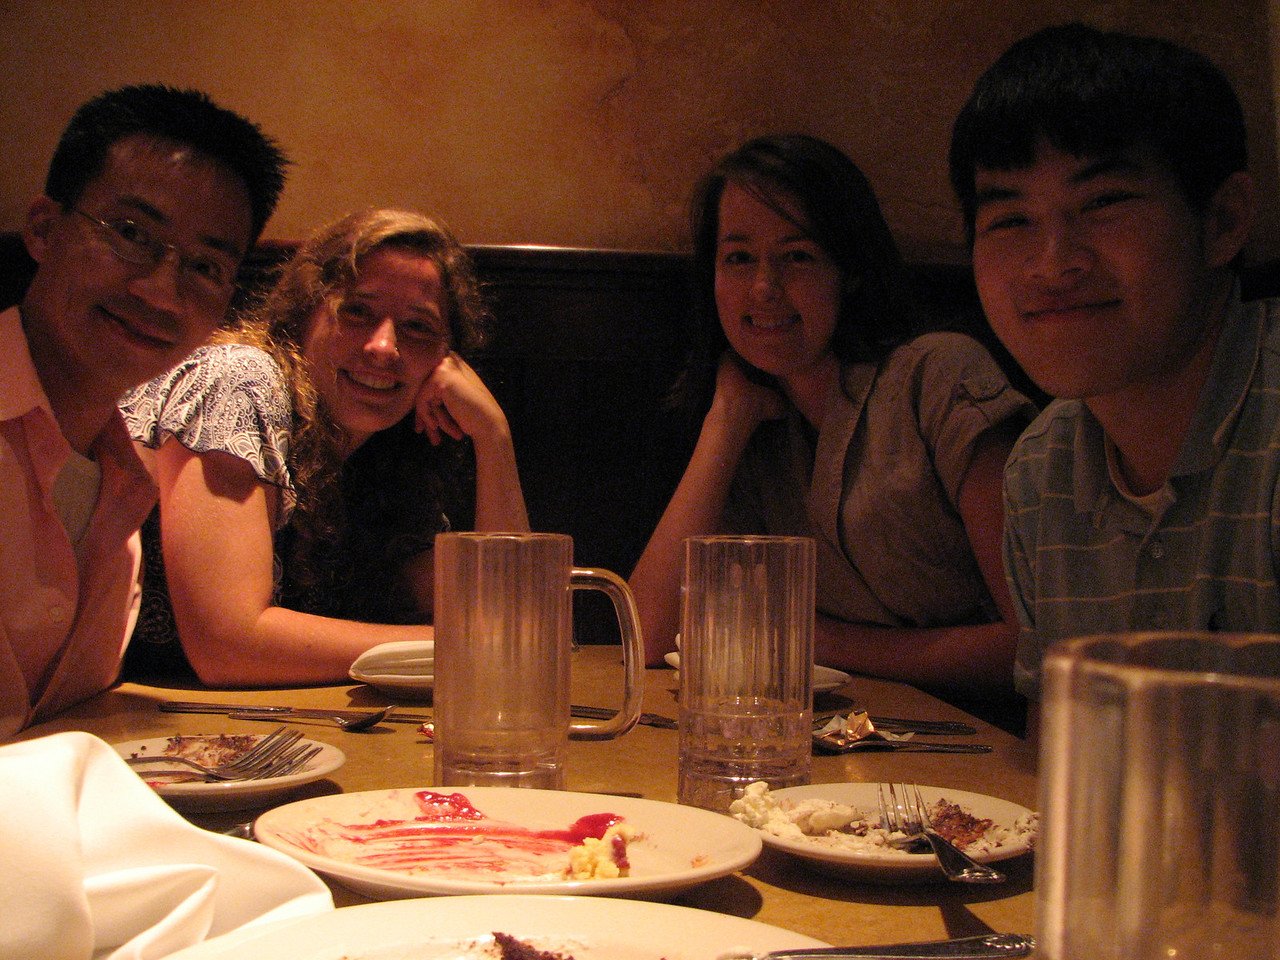 2008 05 03 Sat - Ben Yu, Dannah Dennis, Amy Smith, & Sam Huang @ Old Town Pasadena Cheesecake Factory for post-ballet dessert